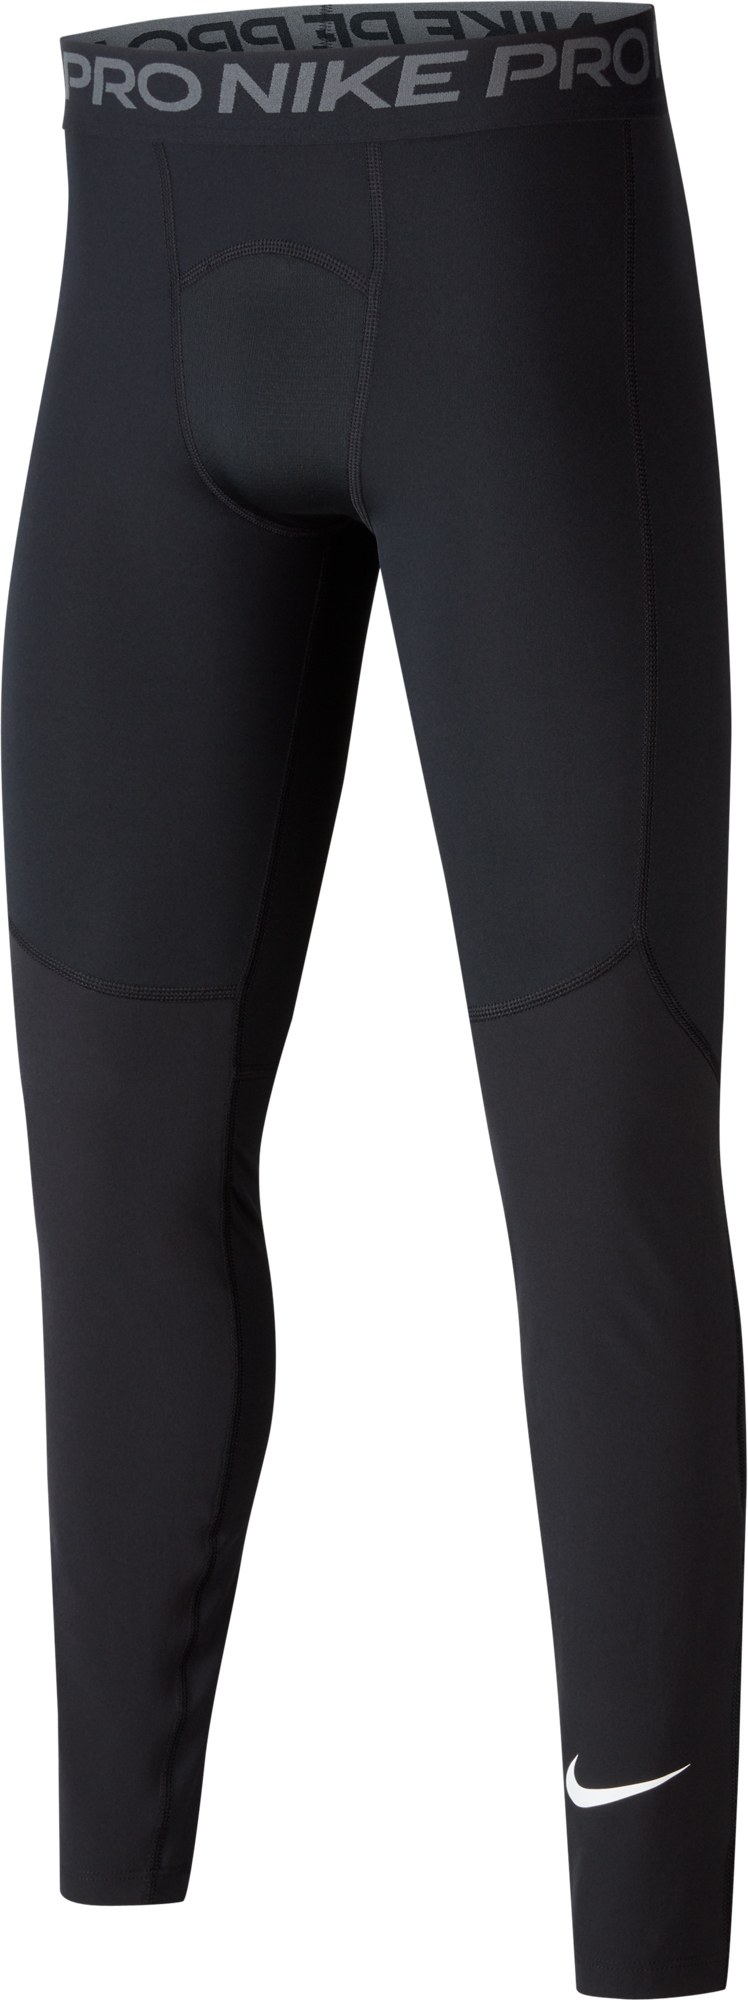 цена на Nike Тайтсы для мальчиков Nike Pro, размер 128-137